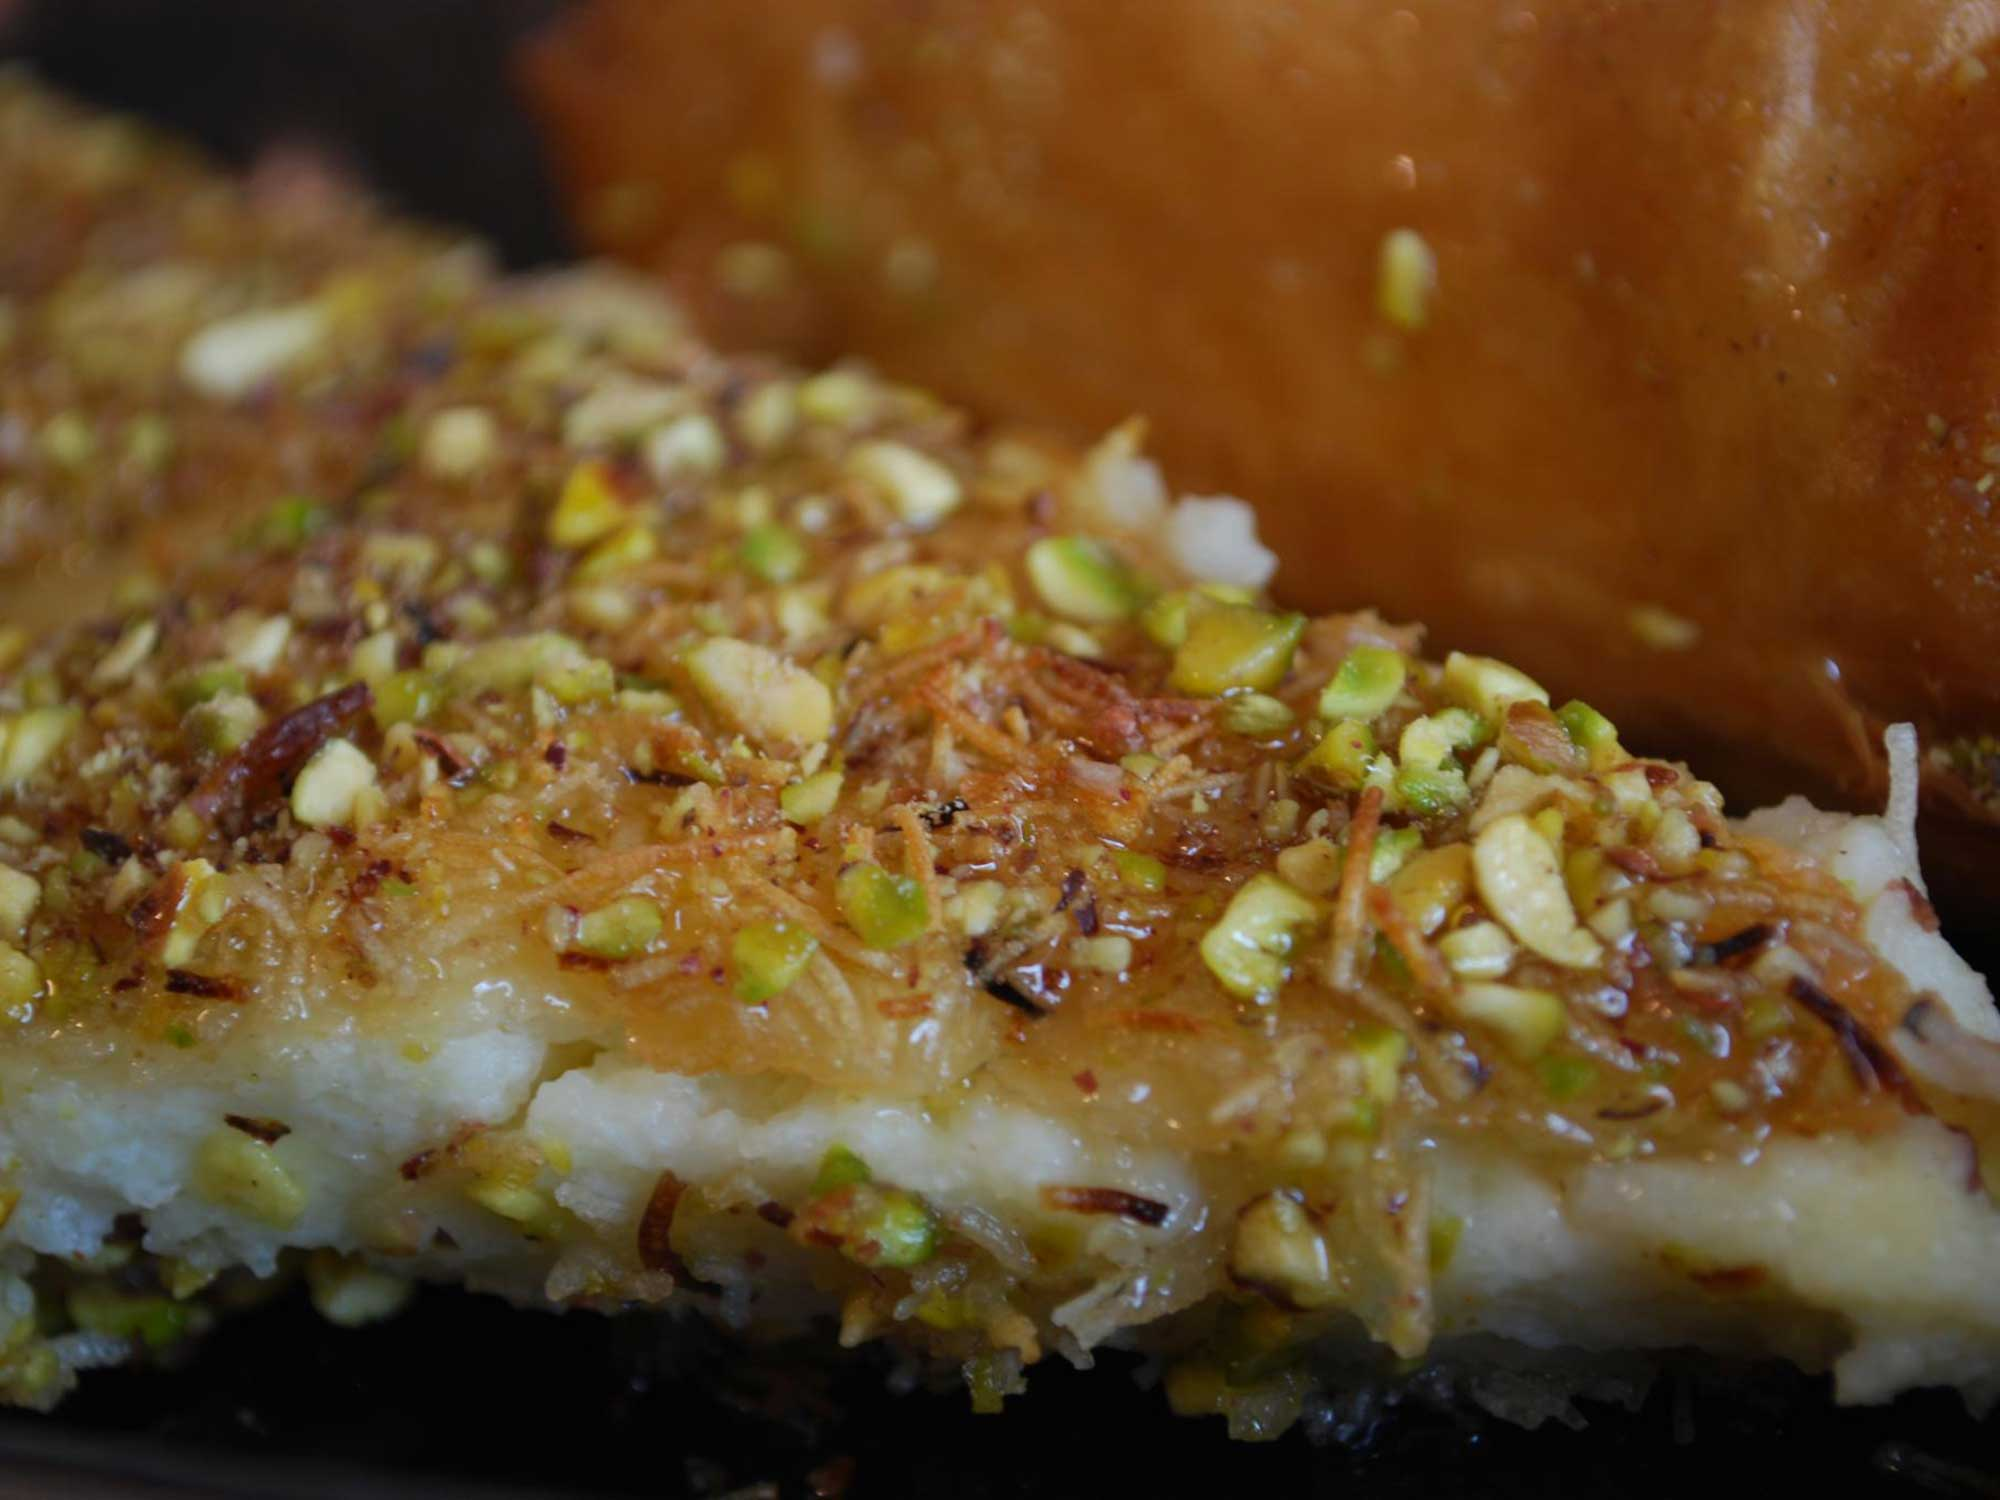 Kanafeh is What Happens When Baklava Meets Mozzarella Sticks